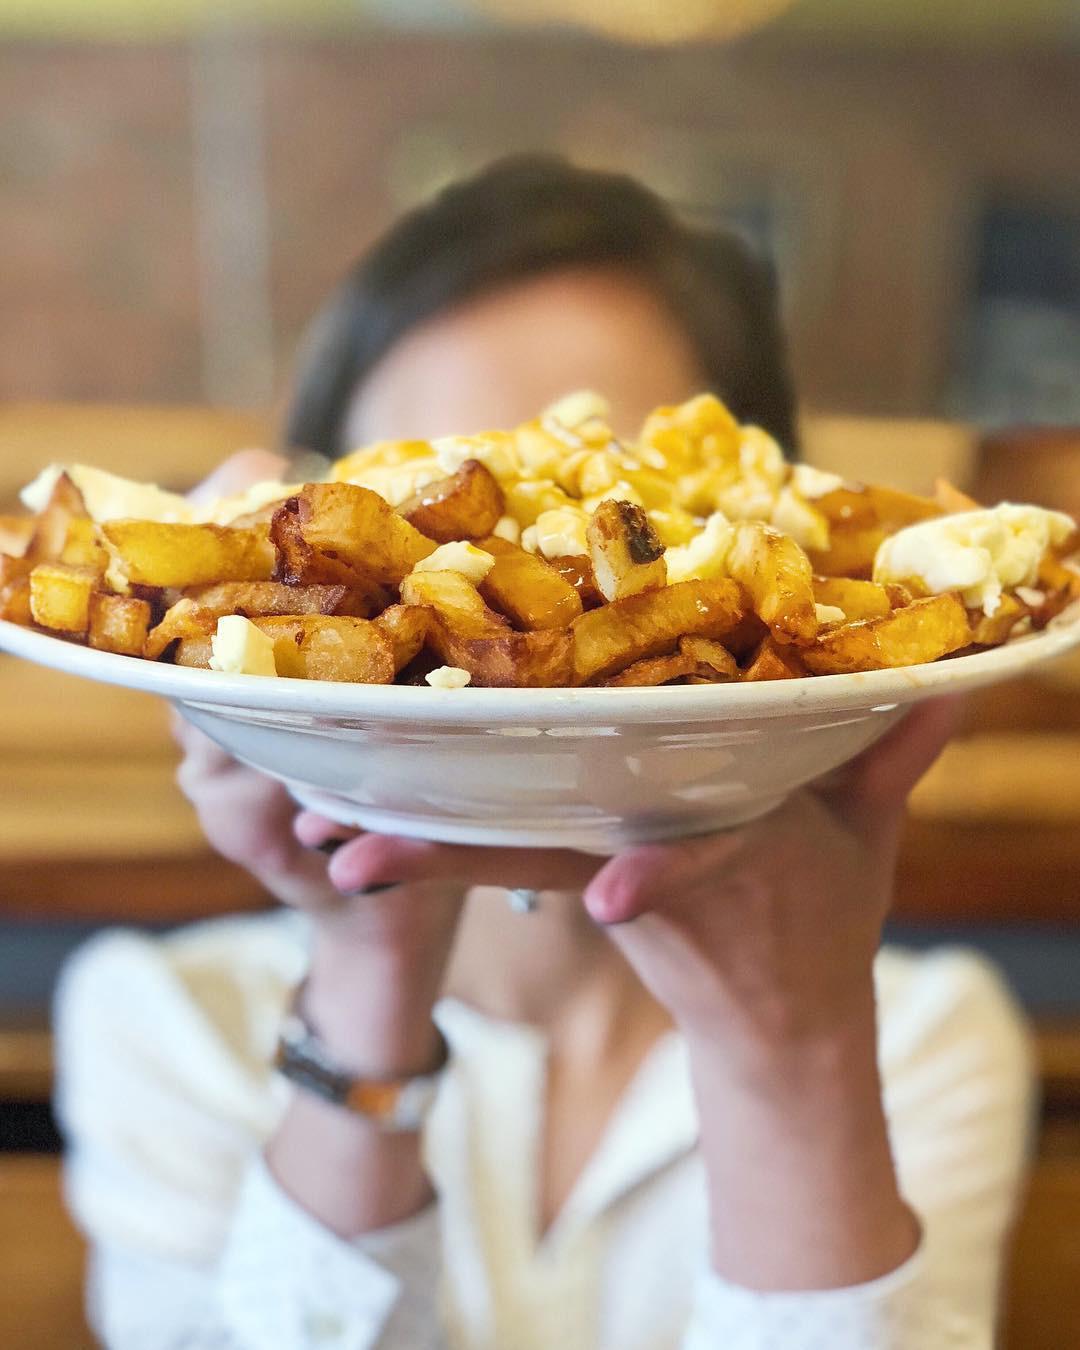 La Banquise, Montréal, Quebec, Canada. instagram.com/foodfacenyc